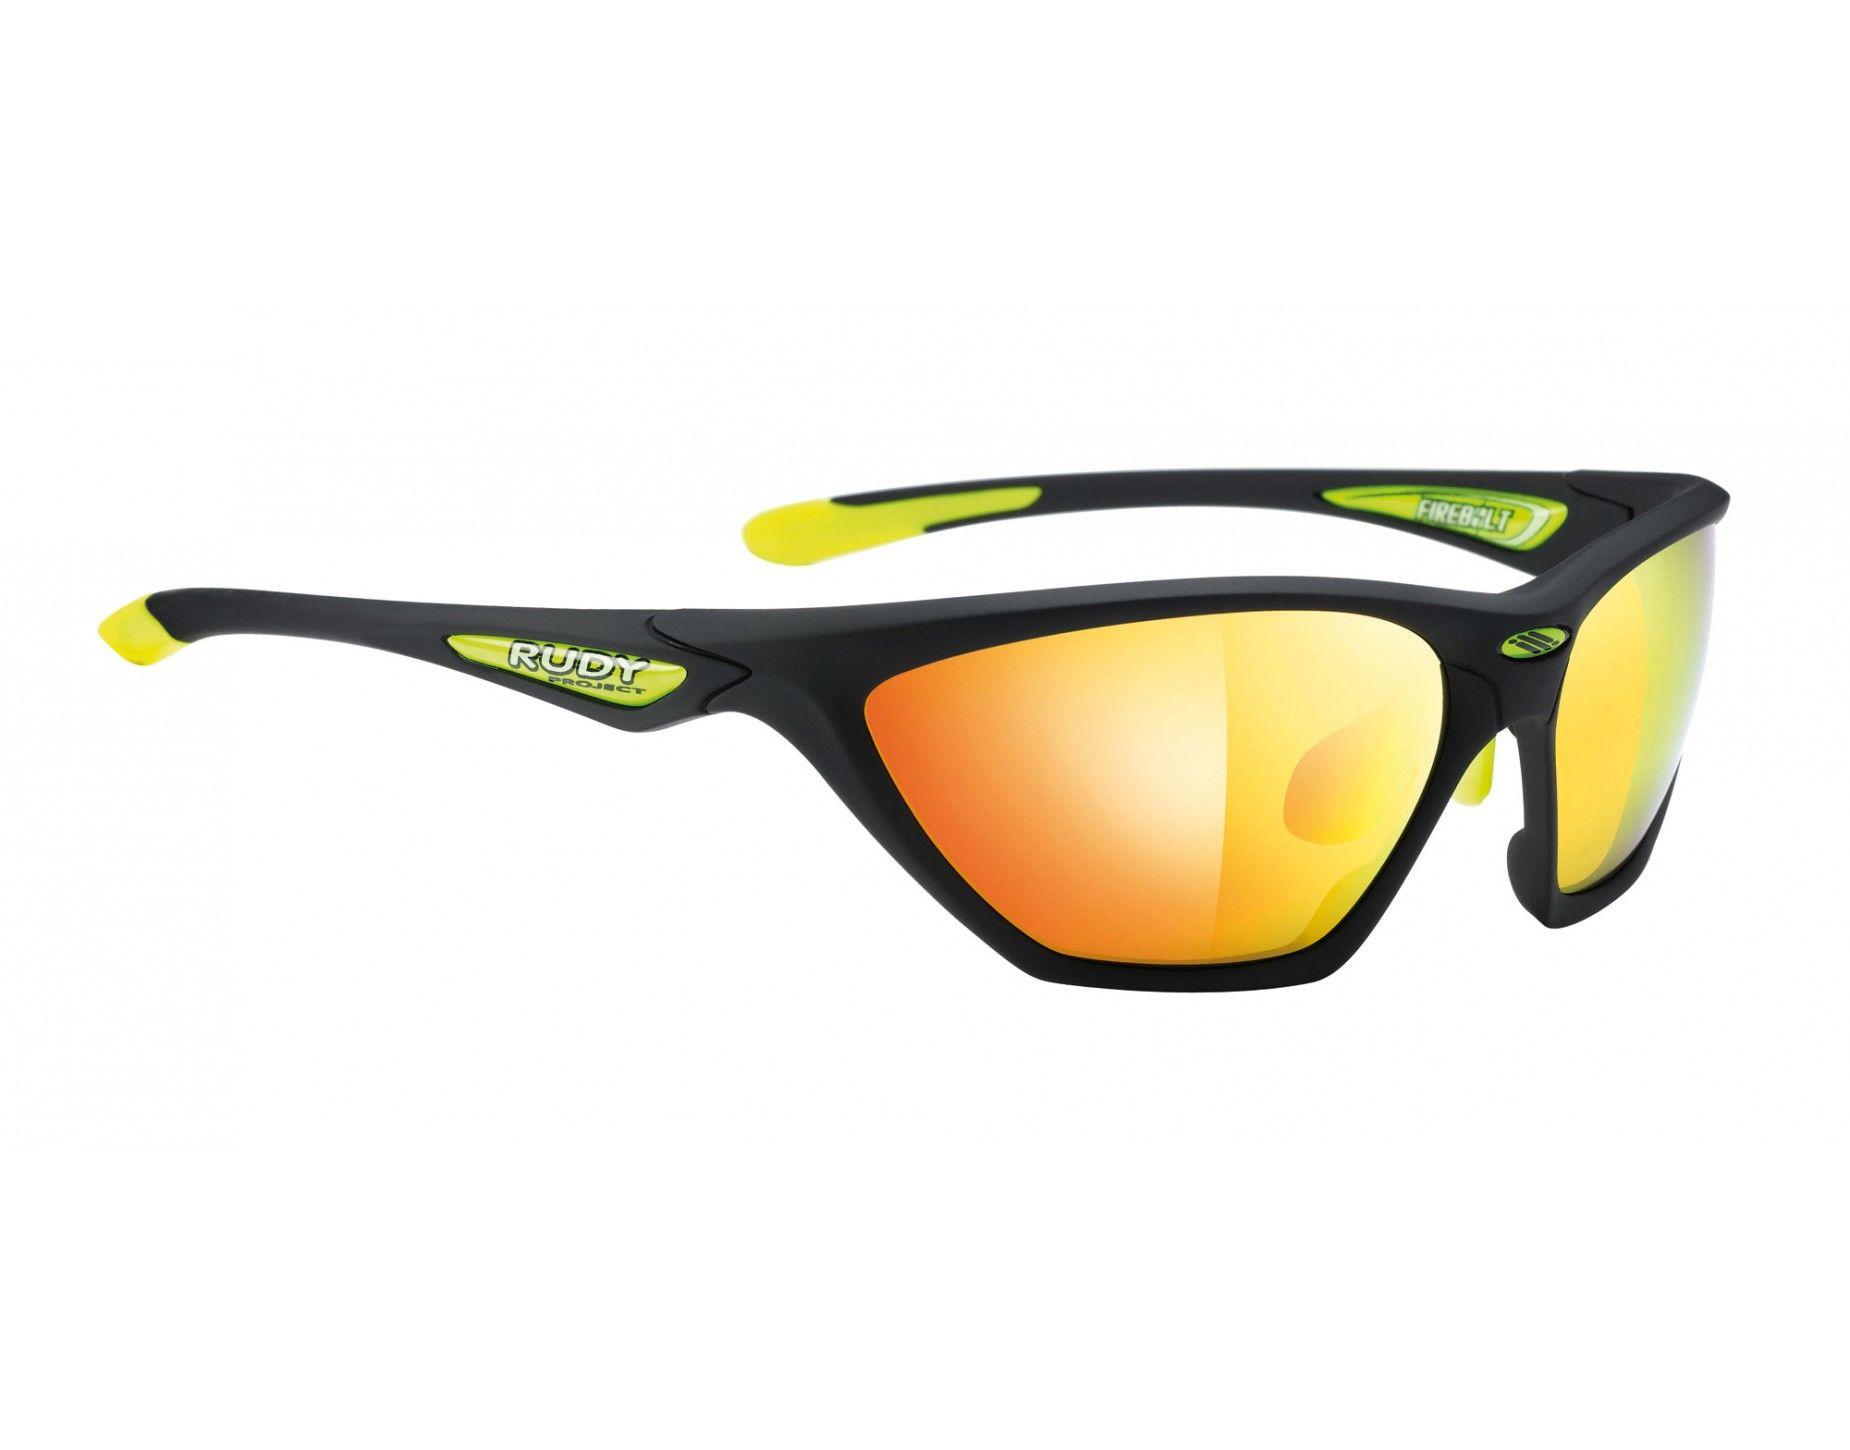 1f415e909020c7 De RUDY PROJECT FIREBOLT bril biedt professionele bescherming tegen licht.  Met…